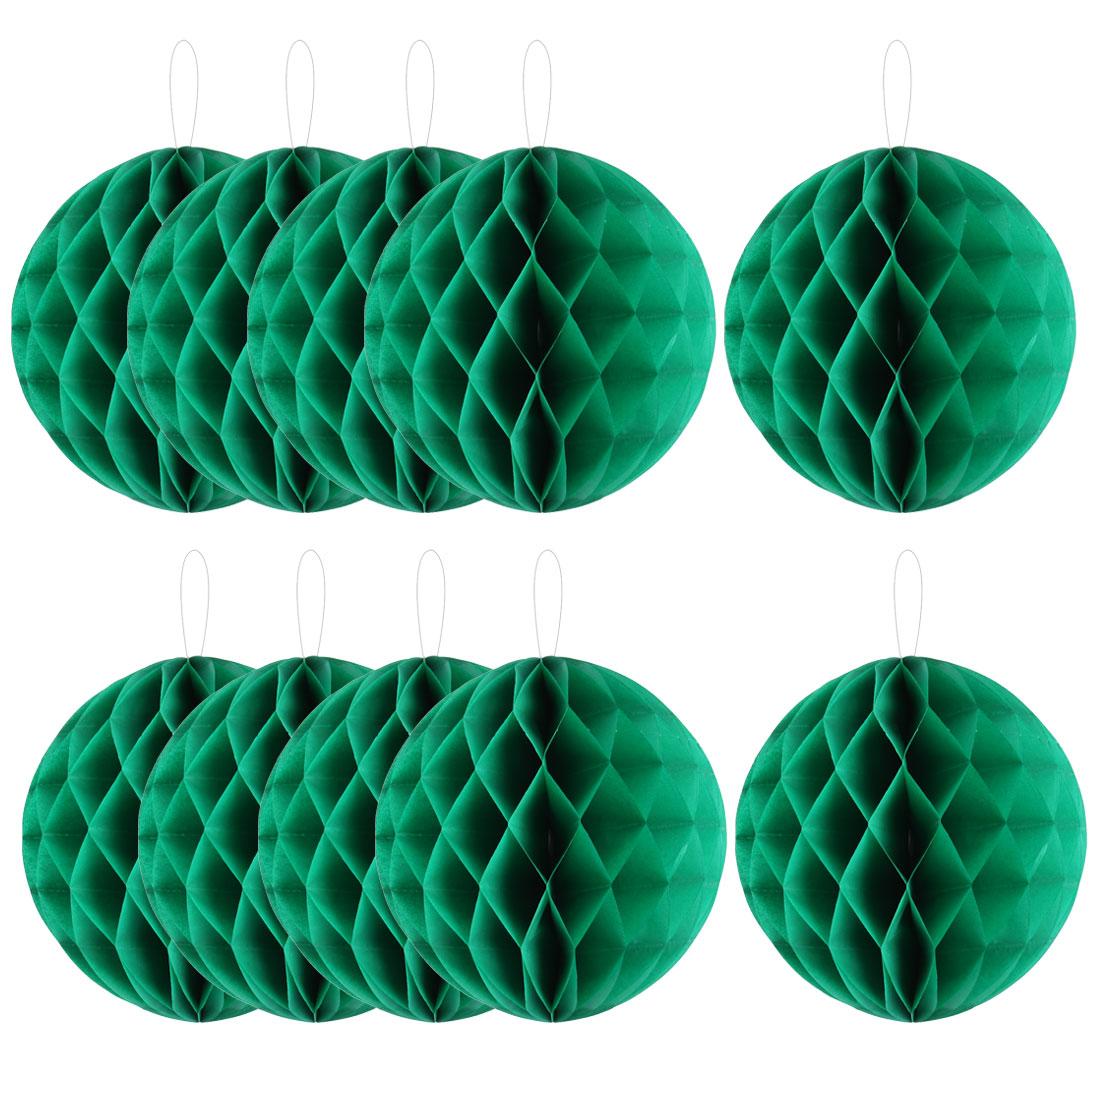 Home Hotel Paper Wall Window Door DIY Decoration Honeycomb Ball Green 12 Inch Dia 10 Pcs